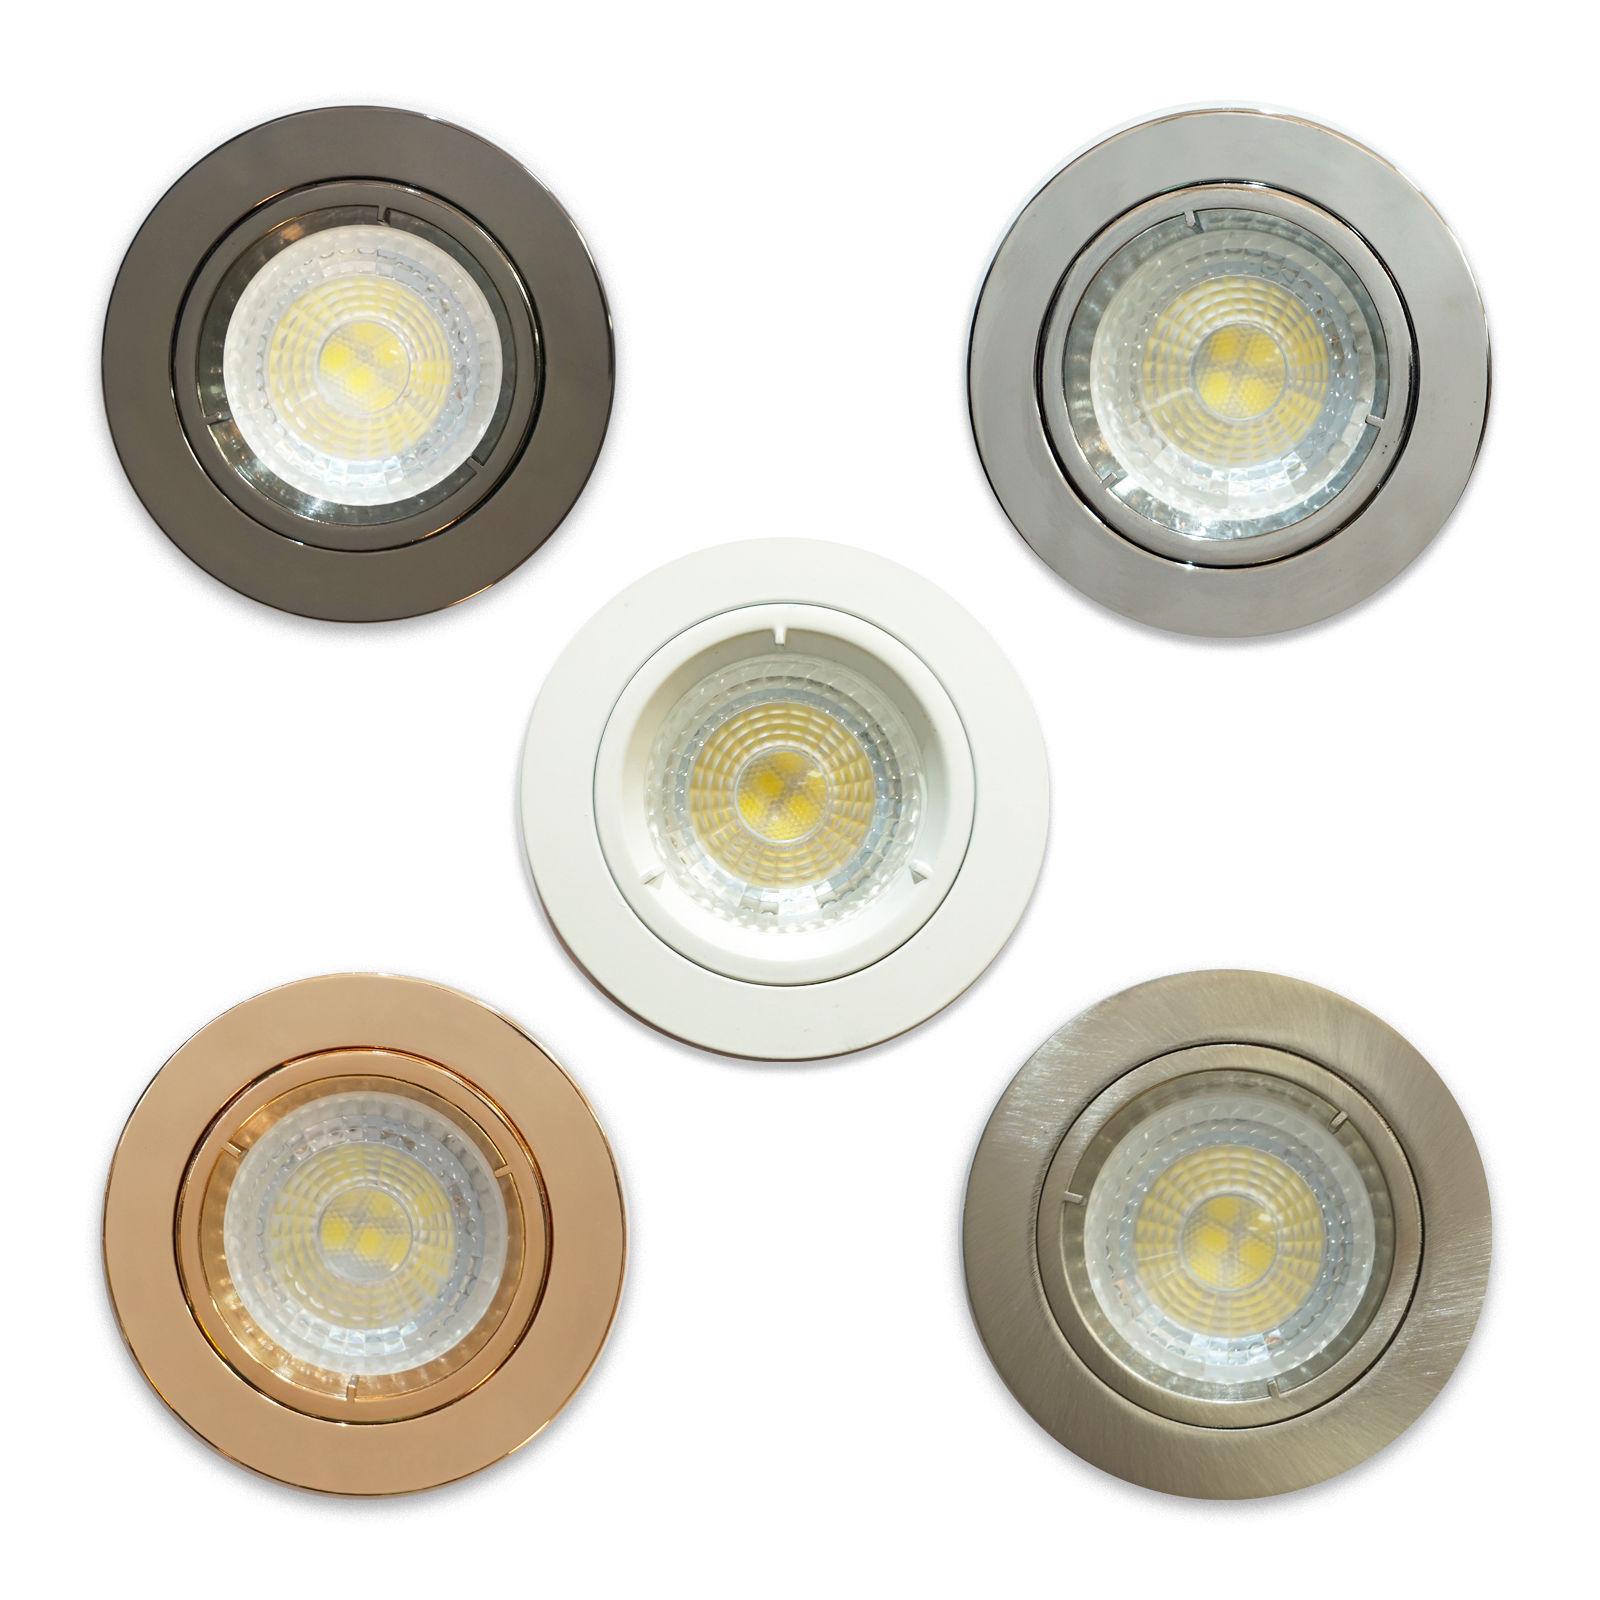 Gu10 Led Recessed Twist Lock Lights Ceiling Spots Ceiling Downlight Spotlights